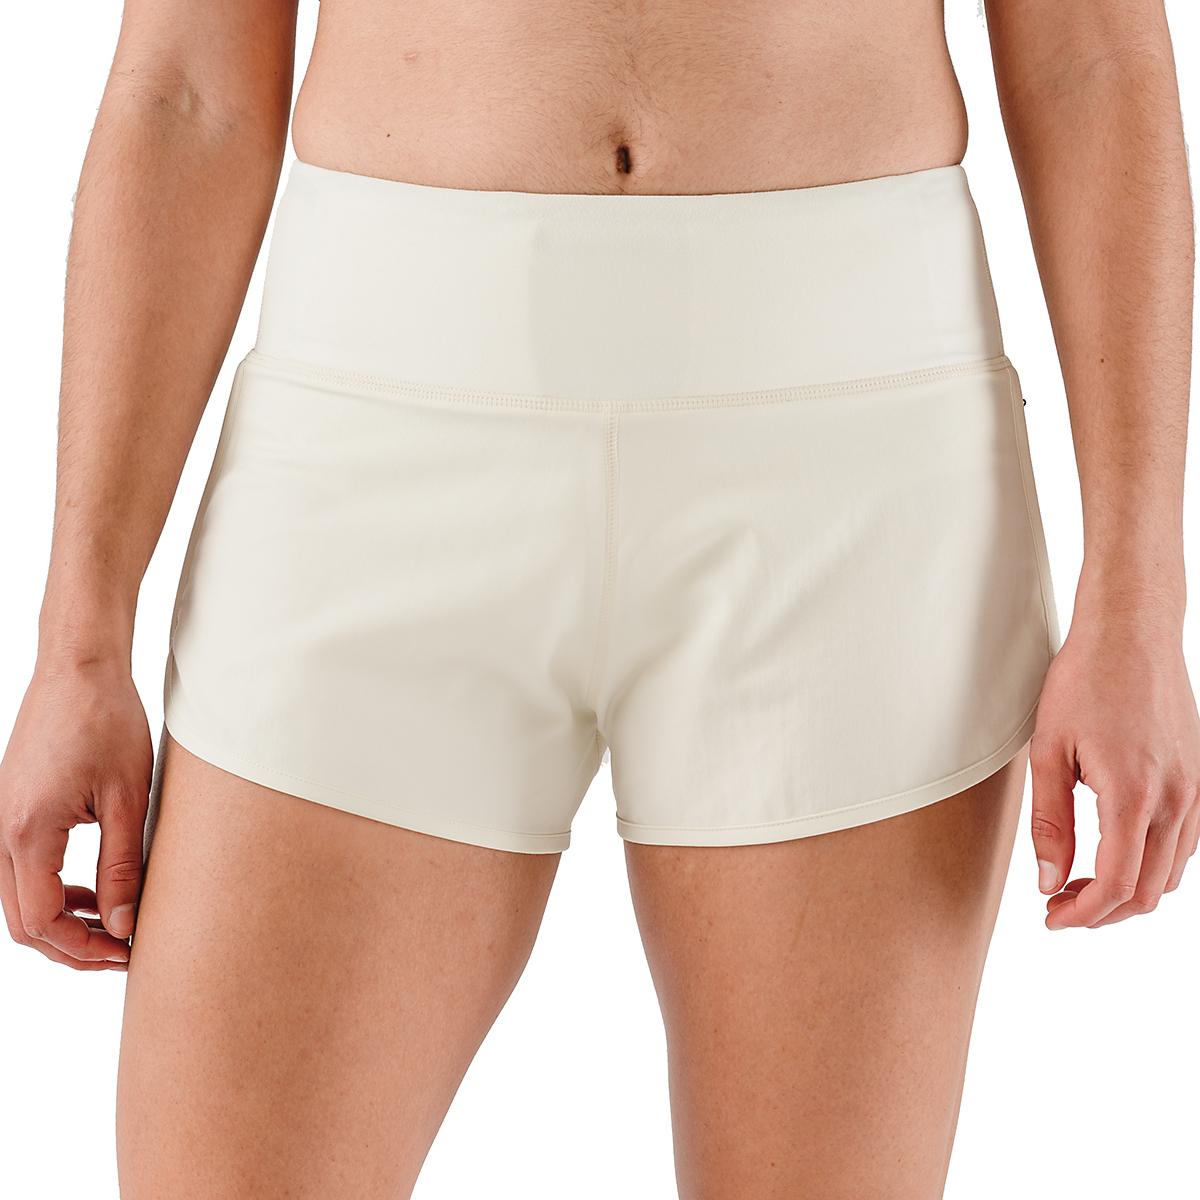 "Women's Rabbit Pocket Shorts 2.5"" - Color: Vanilla Ice - Size: XS, Vanilla Ice, large, image 1"